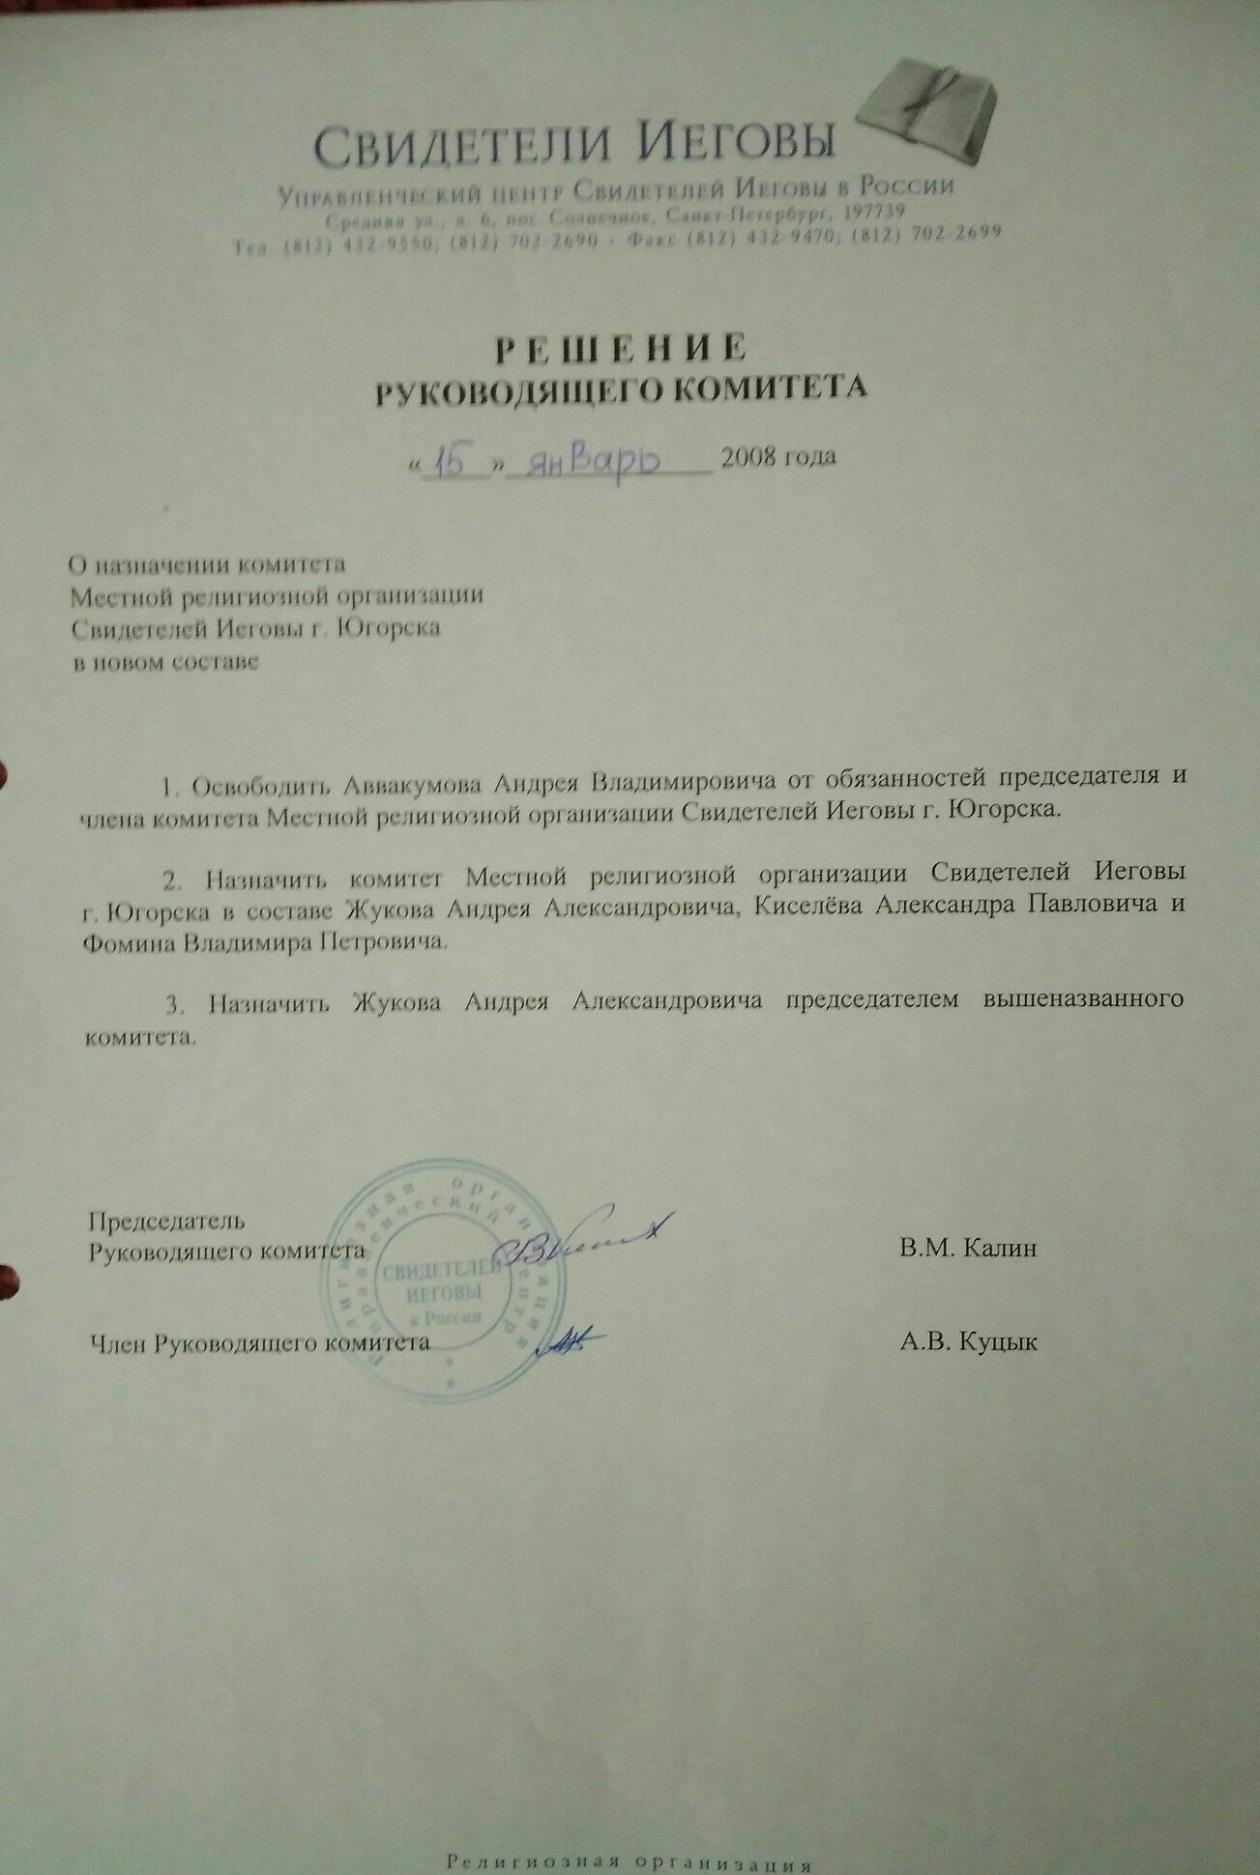 Решение о назначении комитета МРО филиалом_2